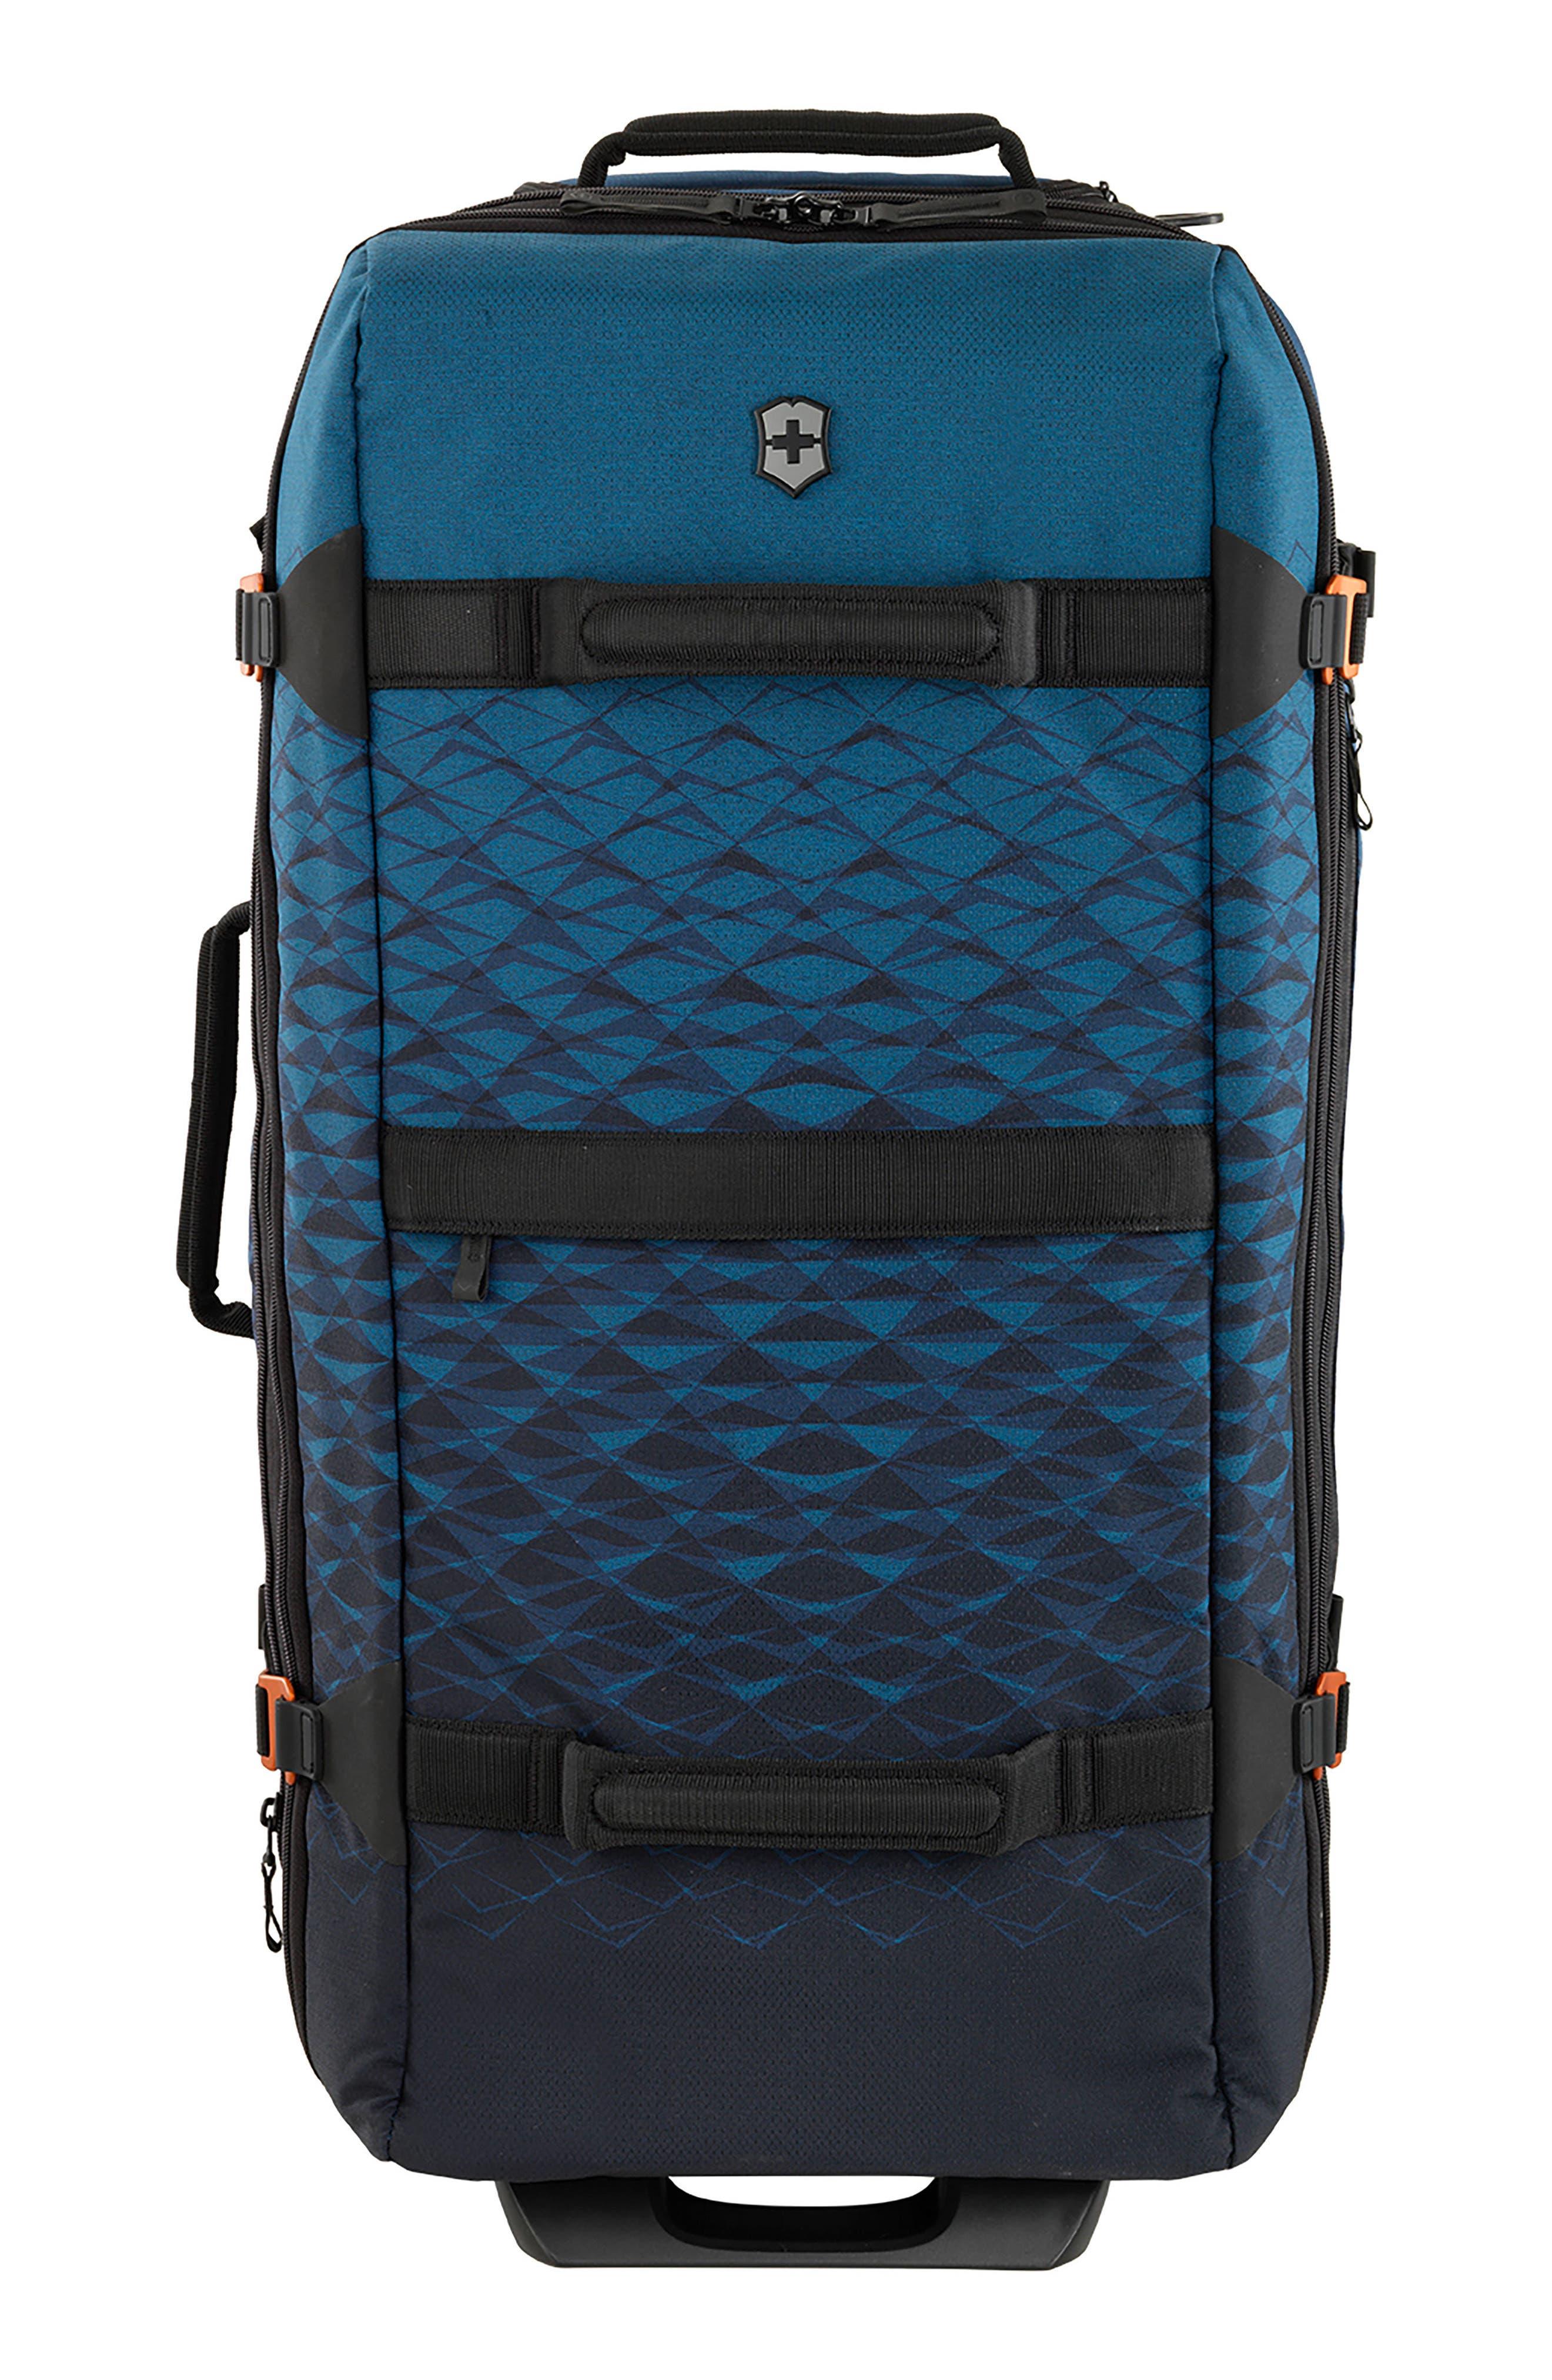 Main Image - Victorinox Swiss Army® VX Touring Large Wheeled Duffel Bag